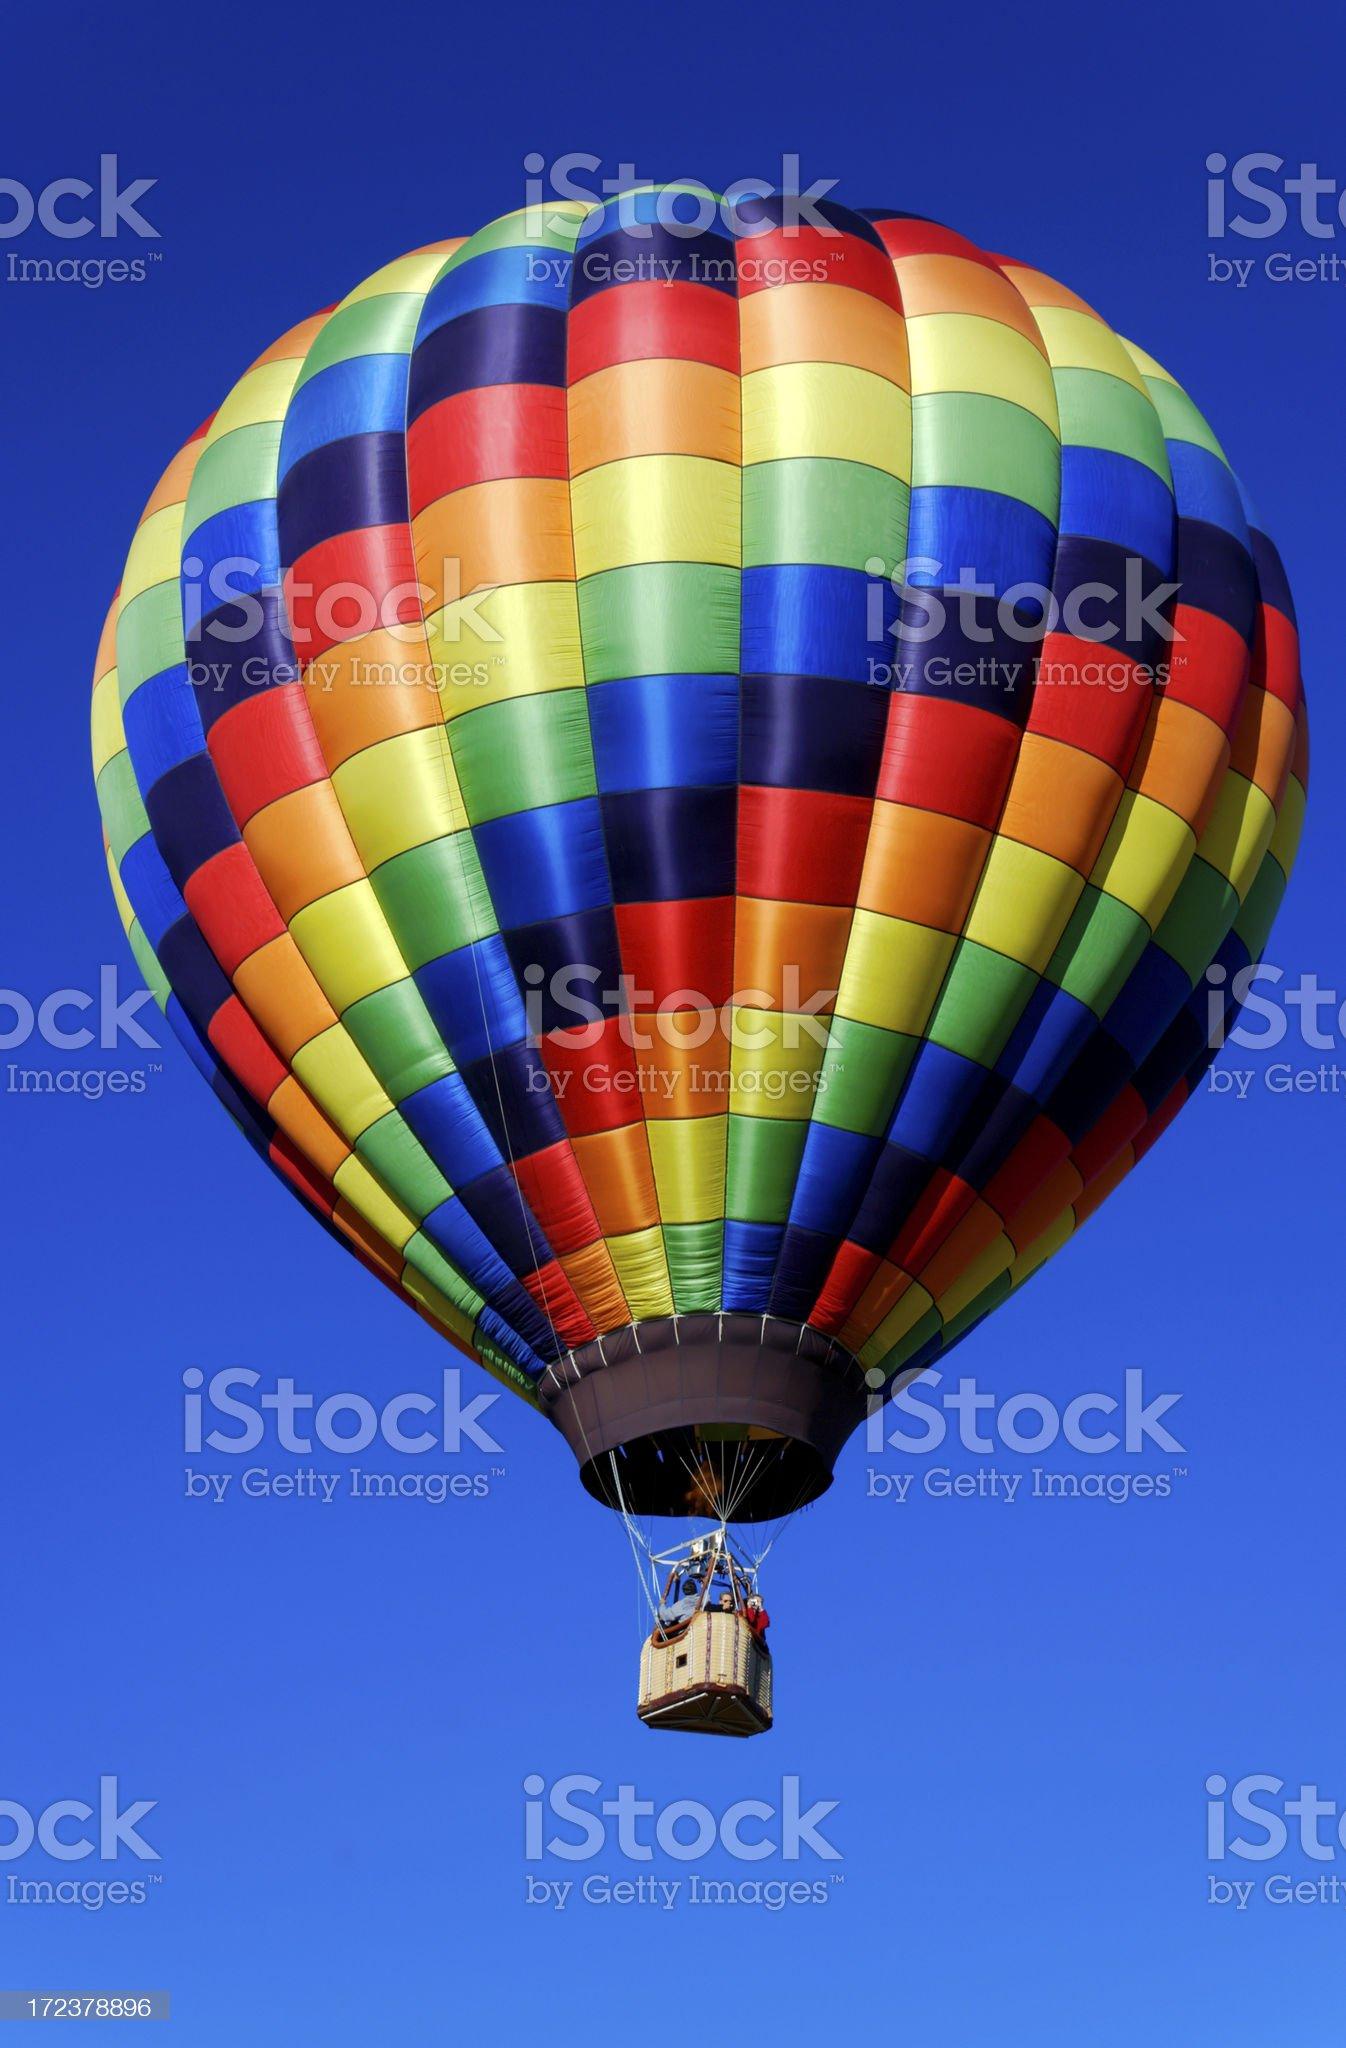 Rainbow Checkered Hot Air Balloon on a Clear Blue Sky royalty-free stock photo